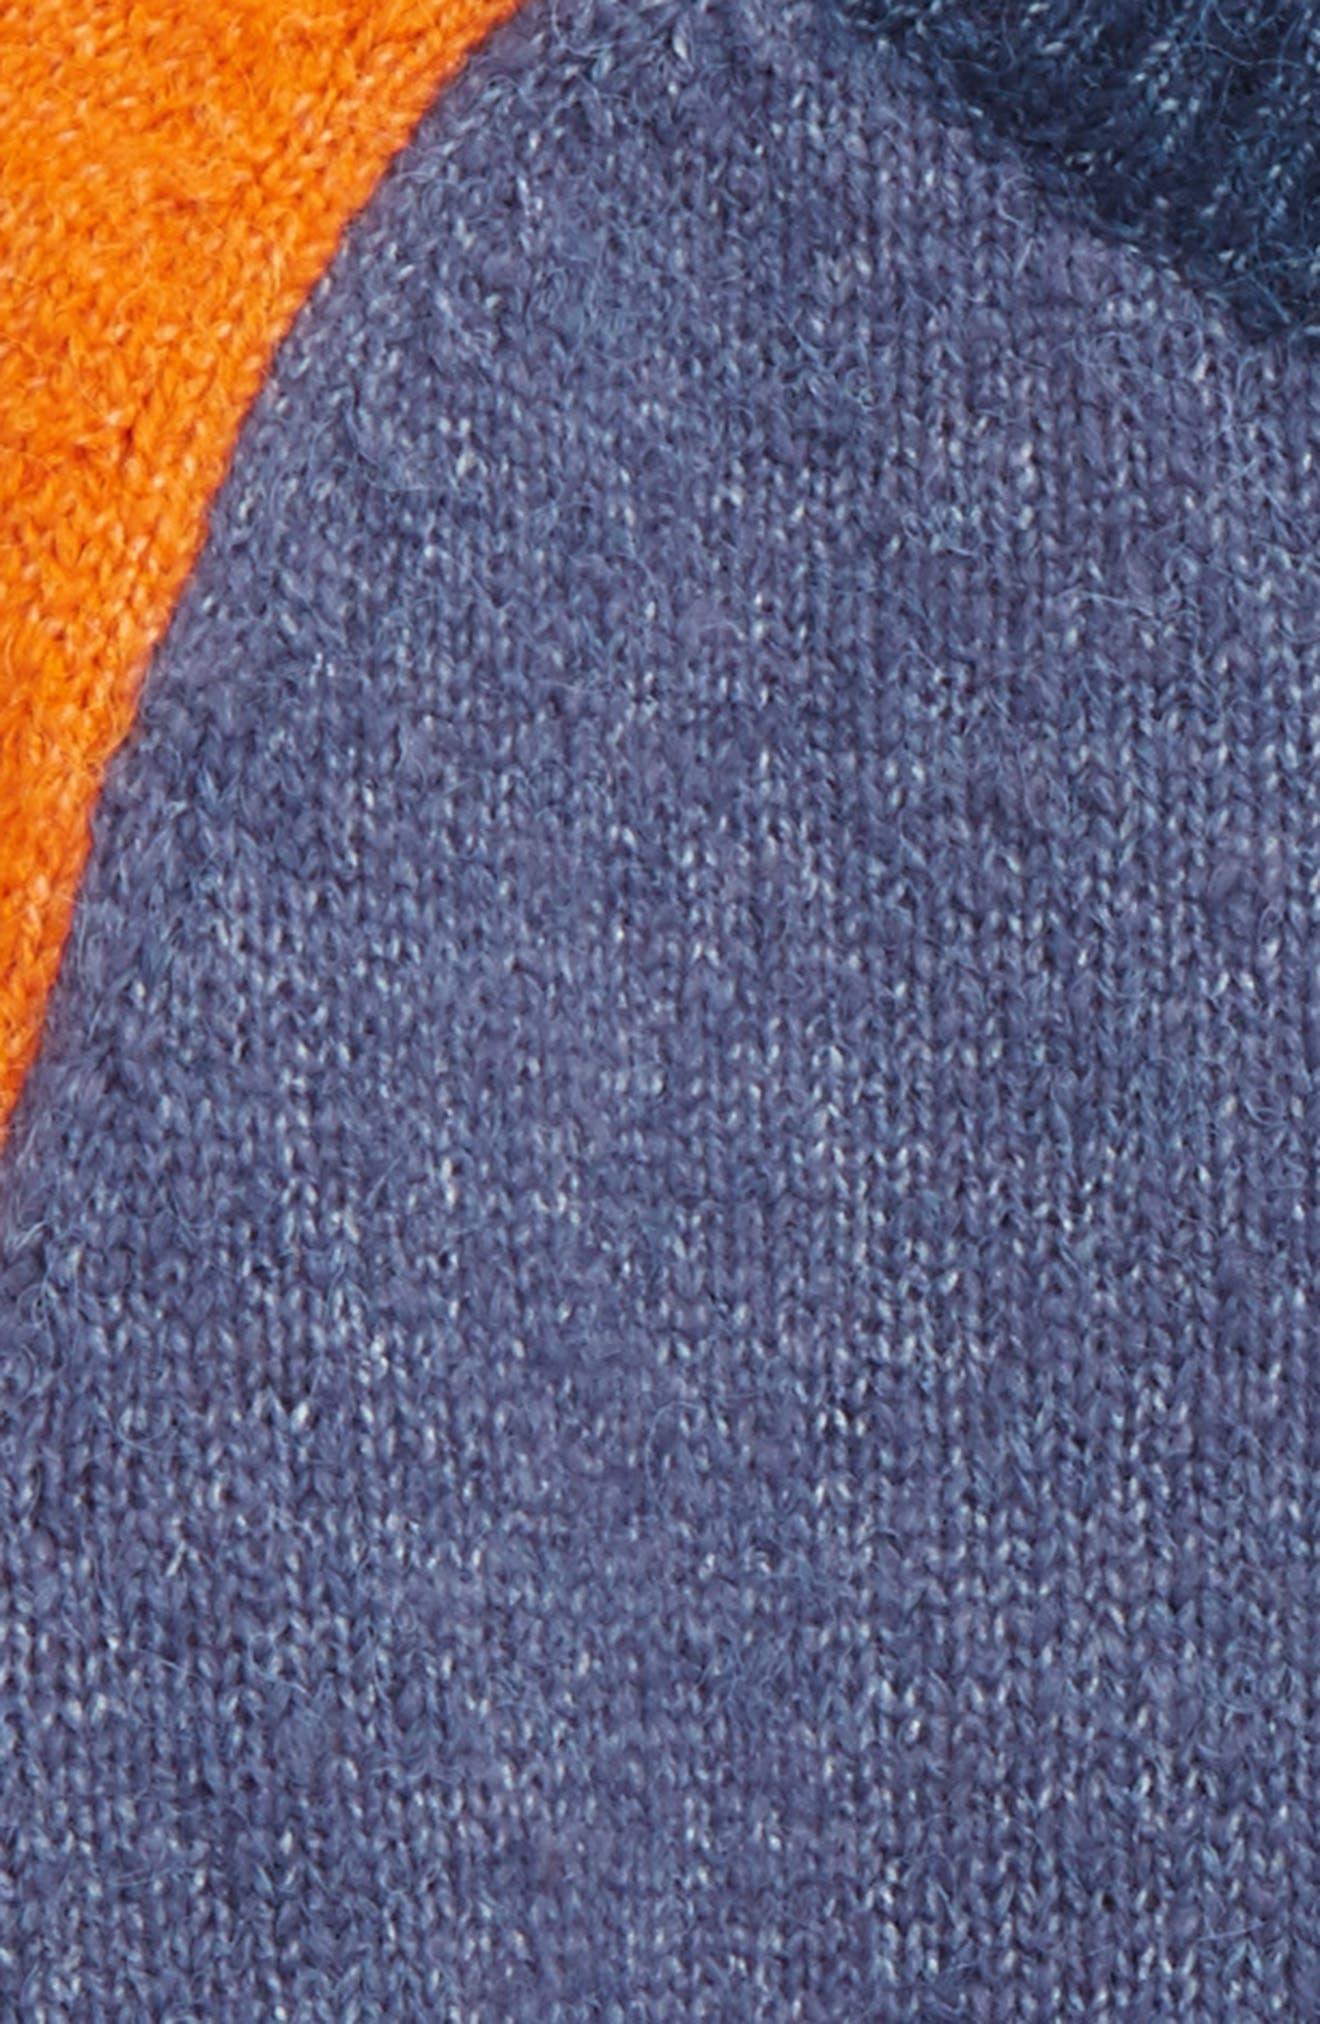 Colorblock Sweater,                             Alternate thumbnail 2, color,                             Blue Vintage Multi